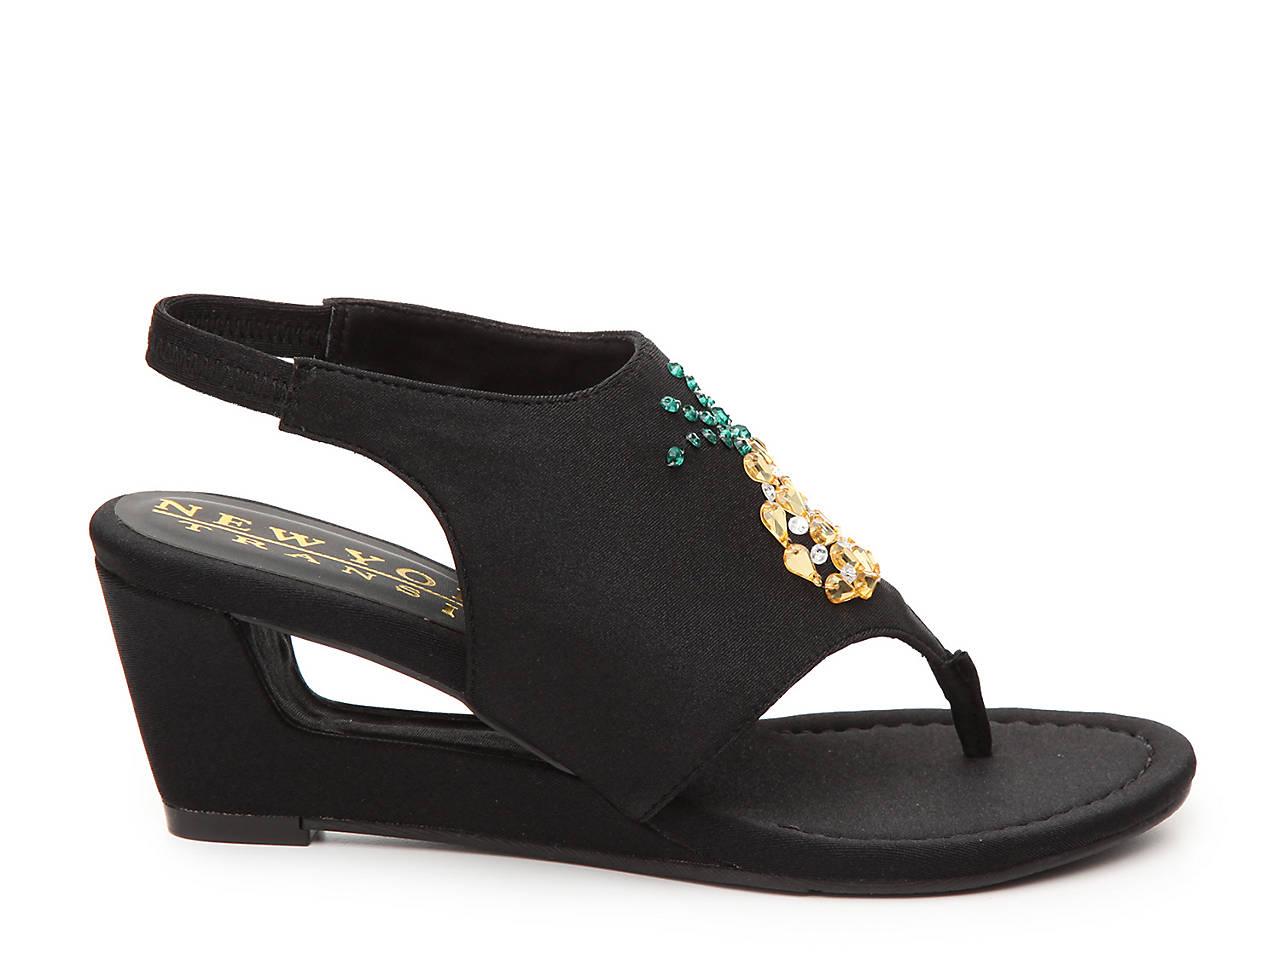 New York Transit Fancy Fruit Wedge Sandal Women s Shoes  234a681d1